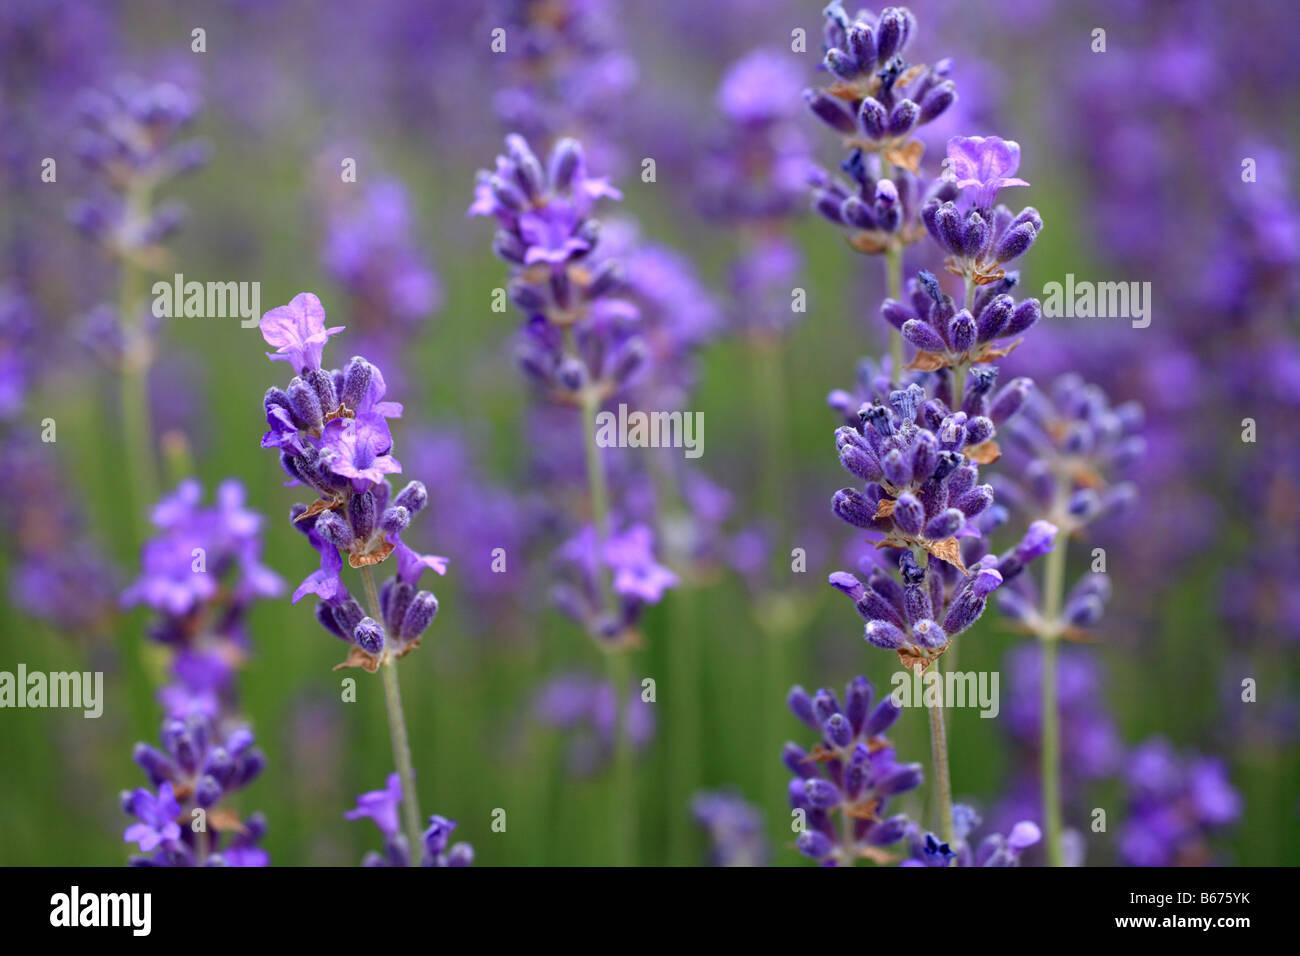 Lavender 'Lavandula angustifolia' purple lilac flower heads, Mediterranean shrub - Stock Image